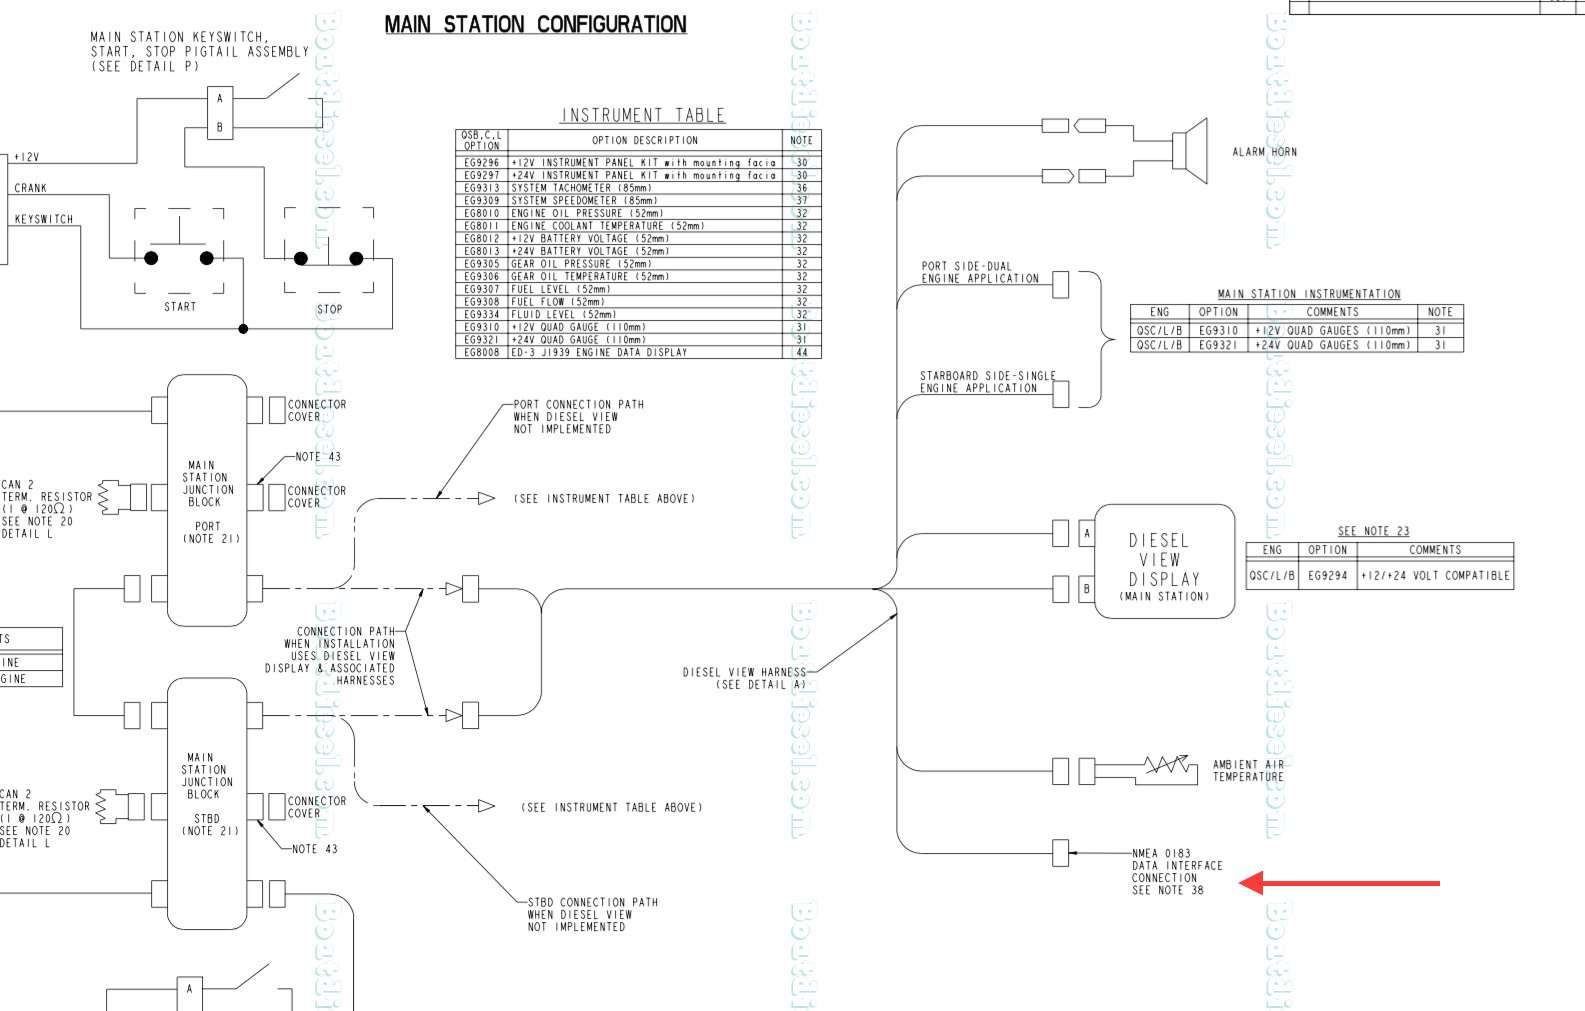 Smartcraft nmea 0183 wiring diagram volvo truck wiring diagrams Ais GPS Wiring-Diagram vessel view 4 installation 100Base-T Wiring Diagram on smartcraft nmea 0183 wiring diagram